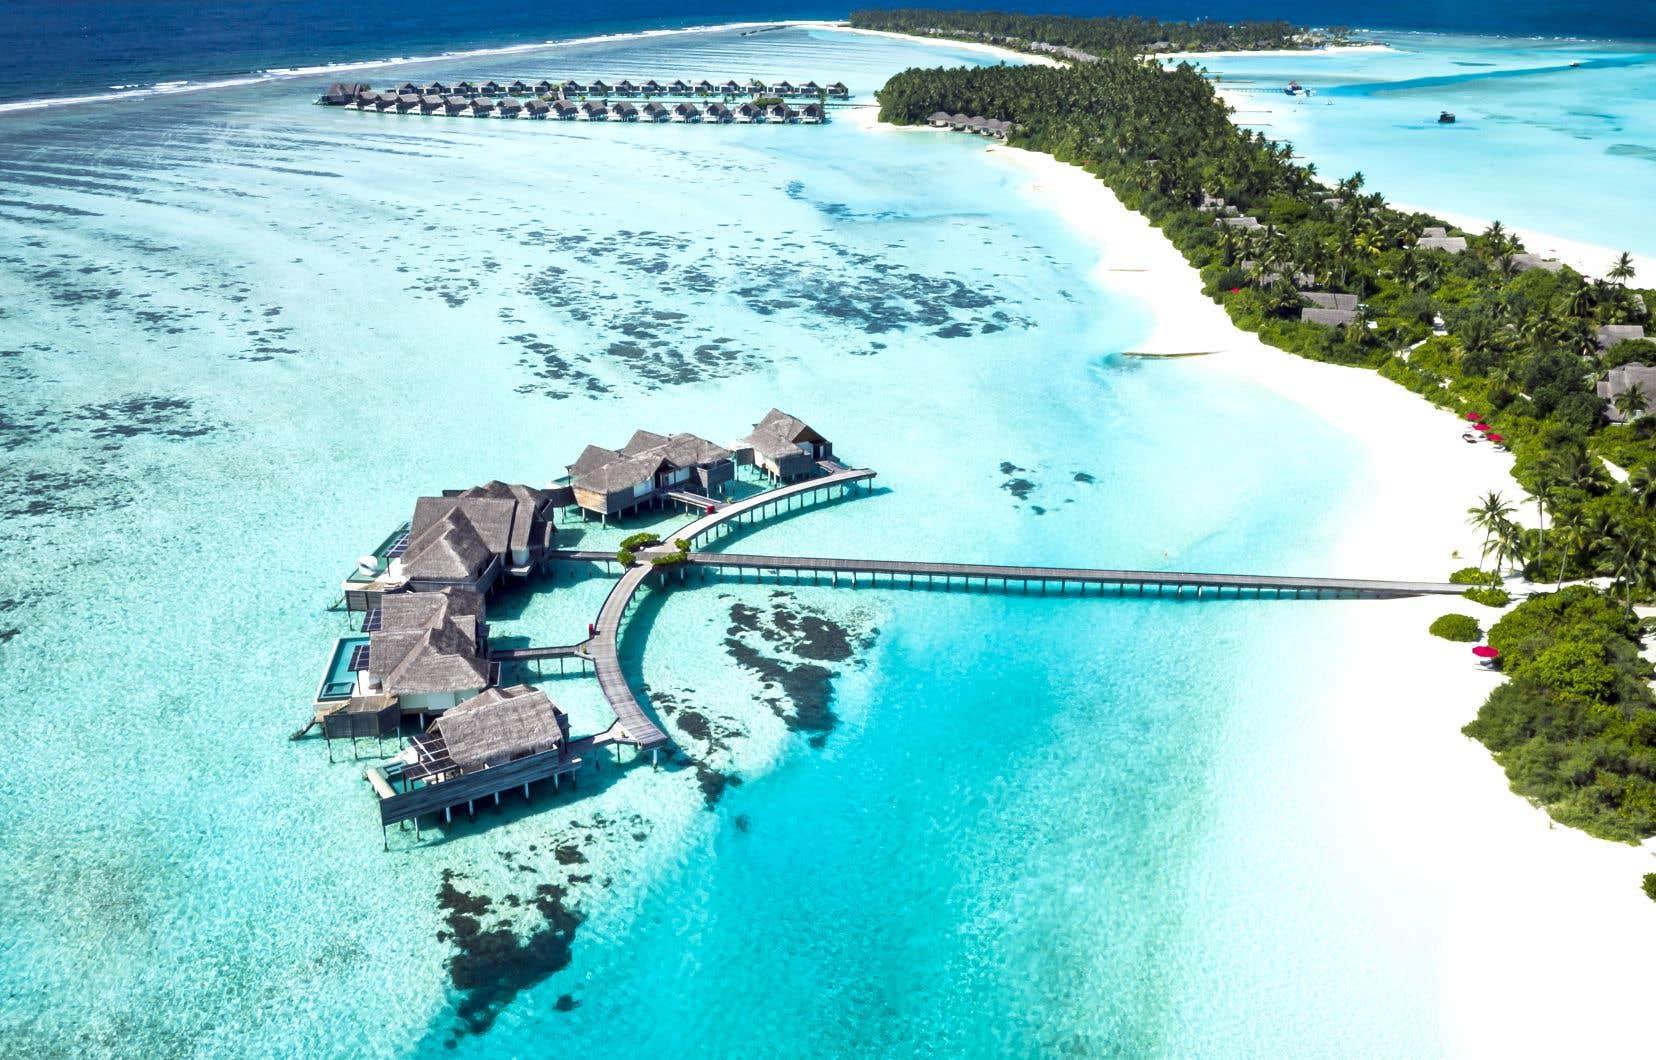 Charmant Ciel, Ce Cyan, Autour De Niyama Private Islands !